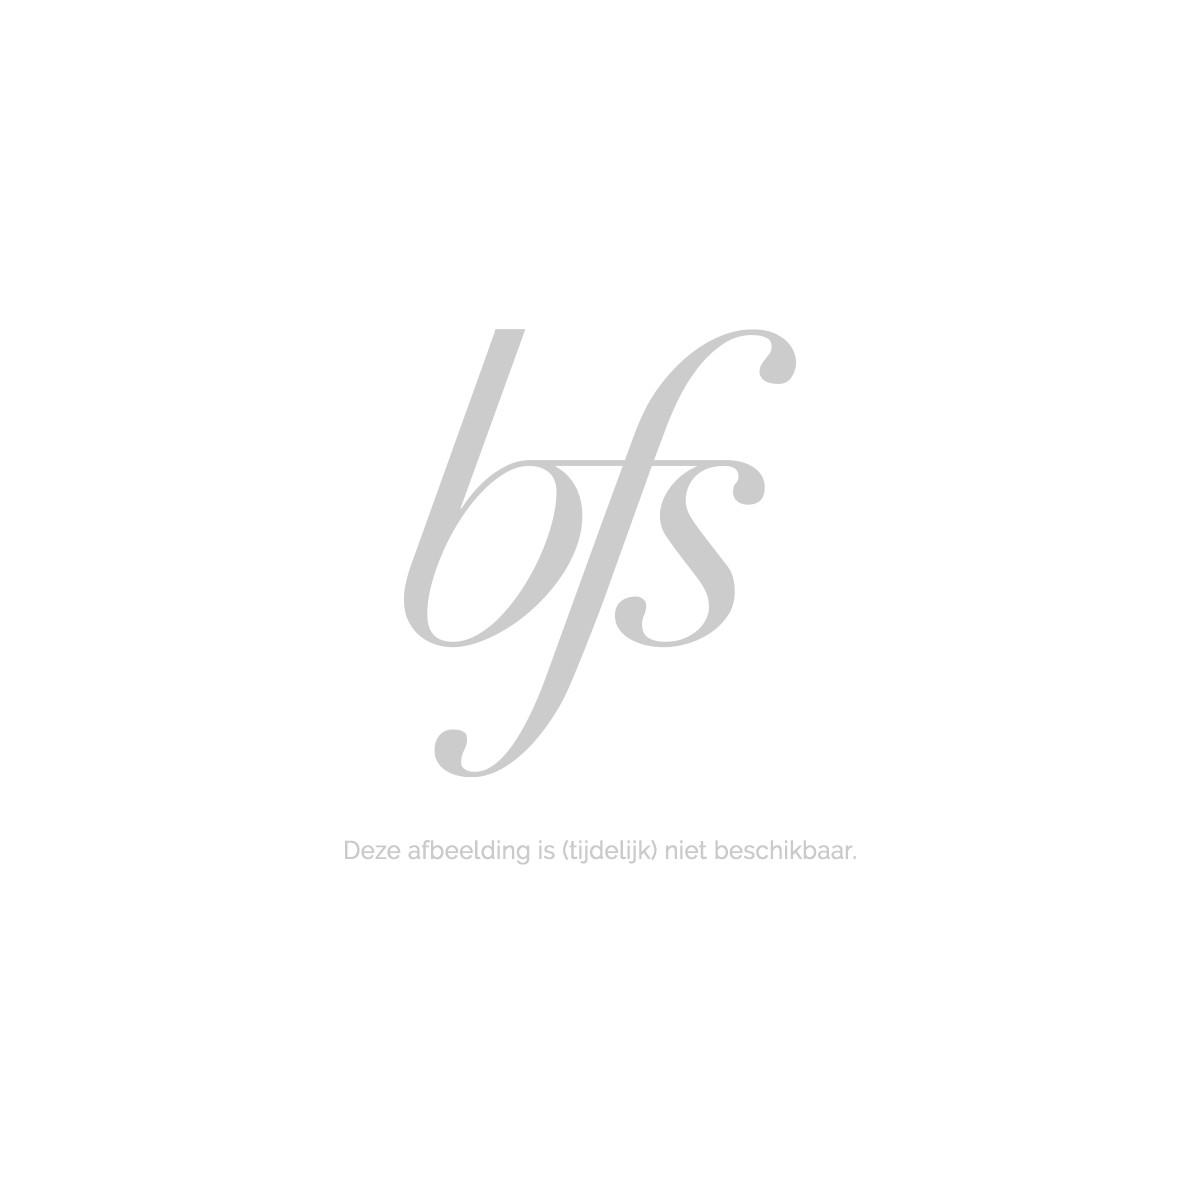 Diva Professional Styling Krultang Intelligent Digital Wand 45Mm-22Mm